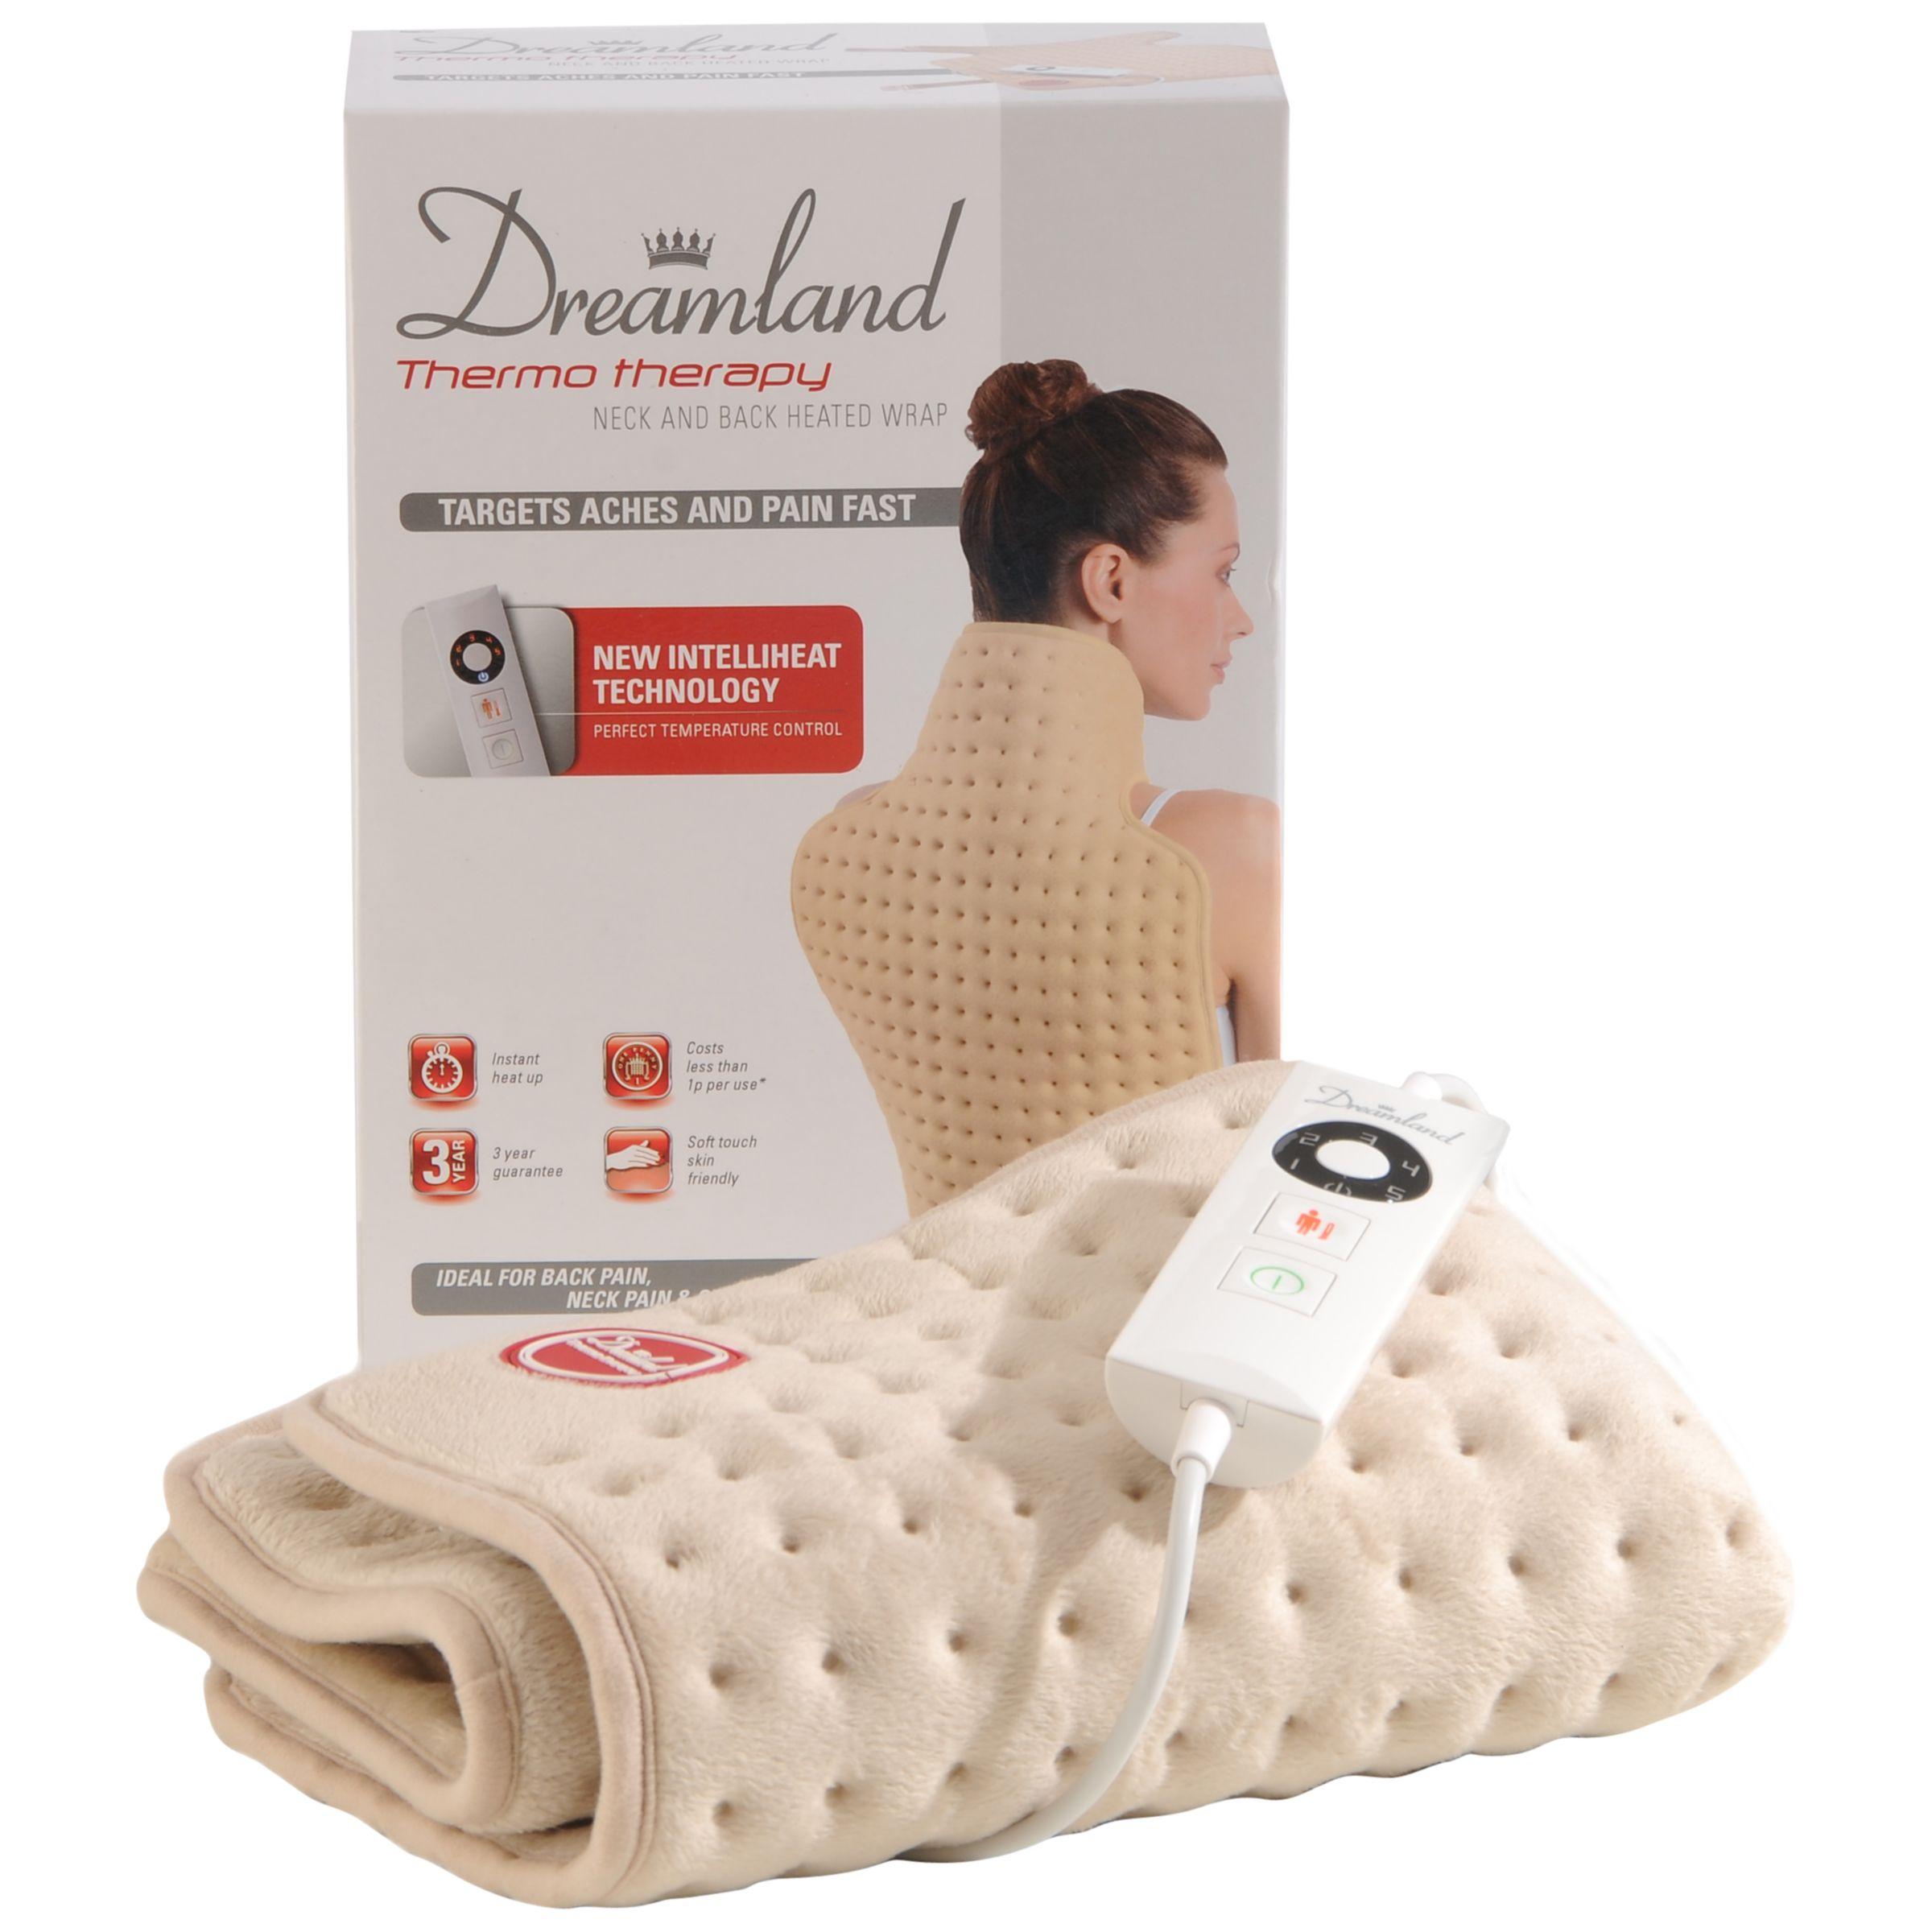 Dreamland Dreamland 16055 Intelliheat Neck and Back Heated Wrap